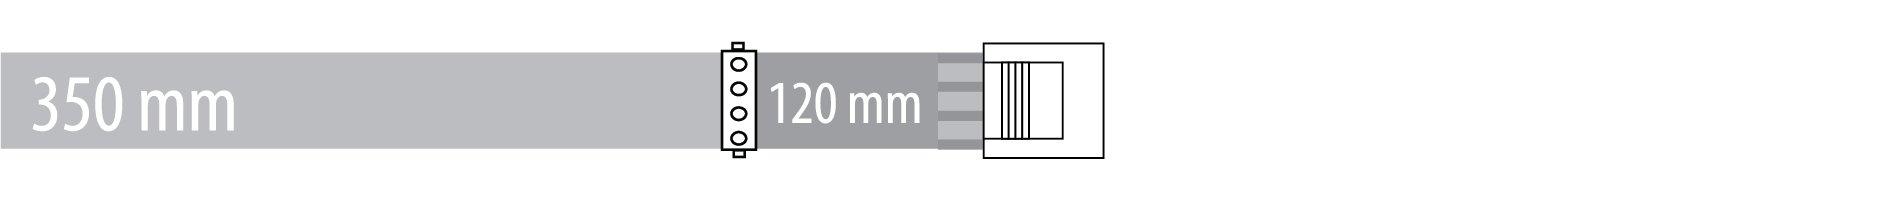 Peripheral 350 + 120 mm